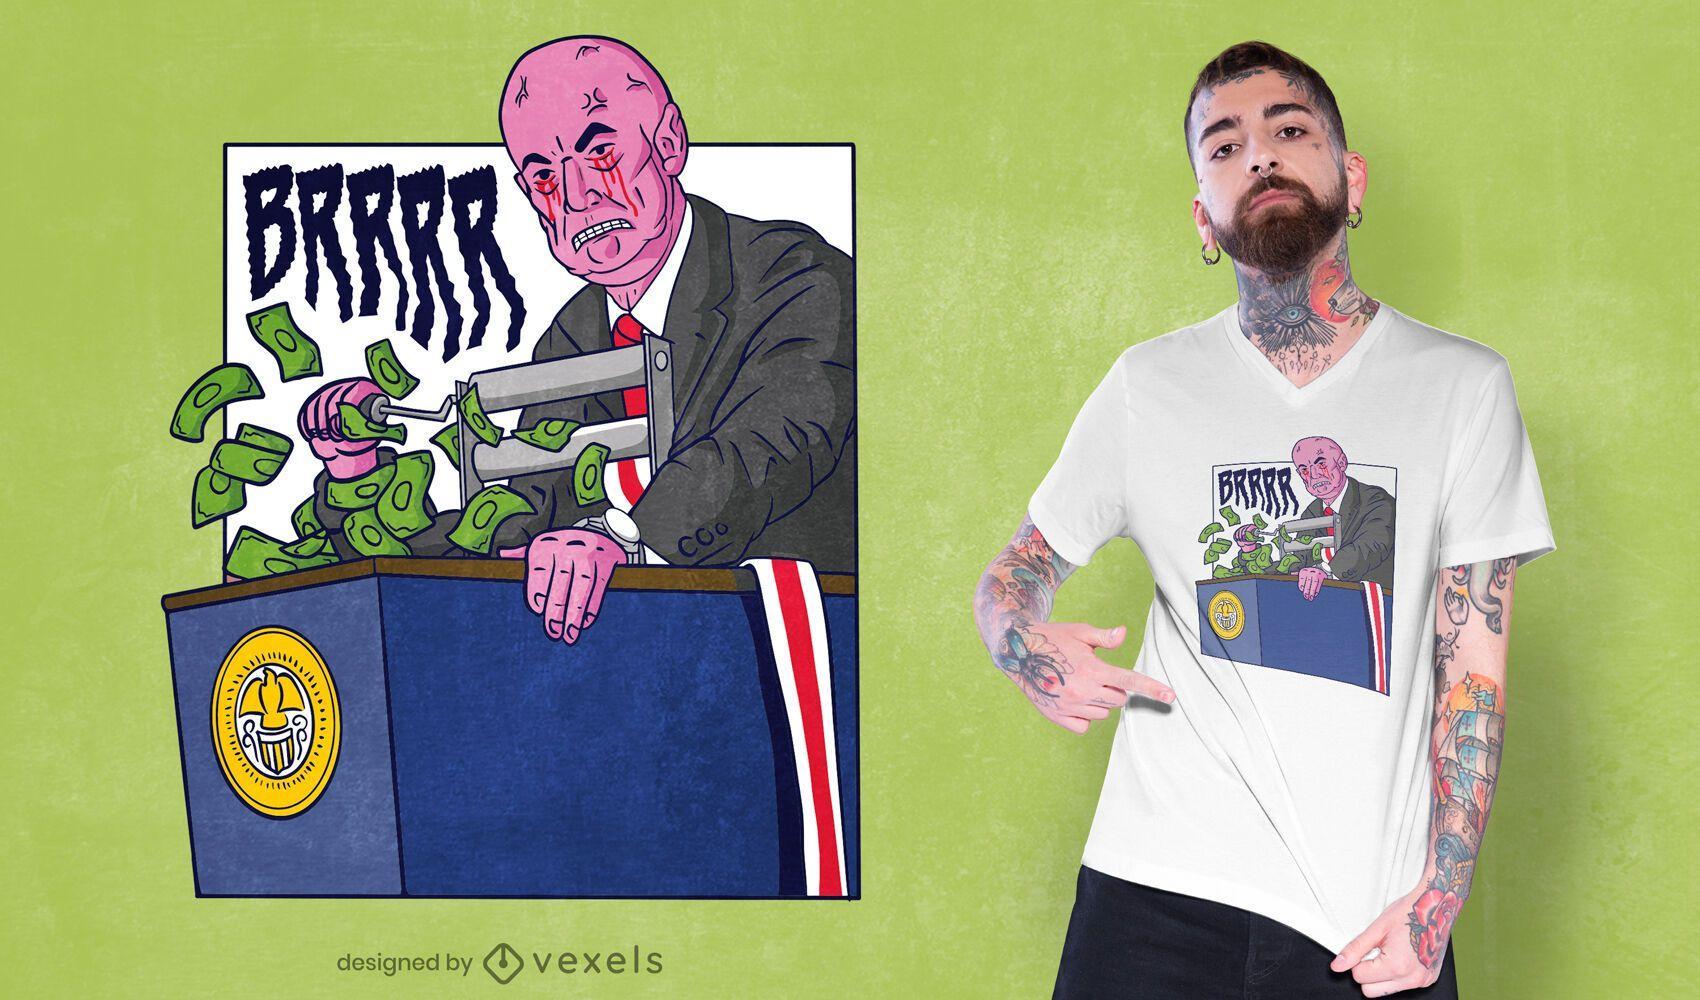 Money printer brr meme diseño de camiseta